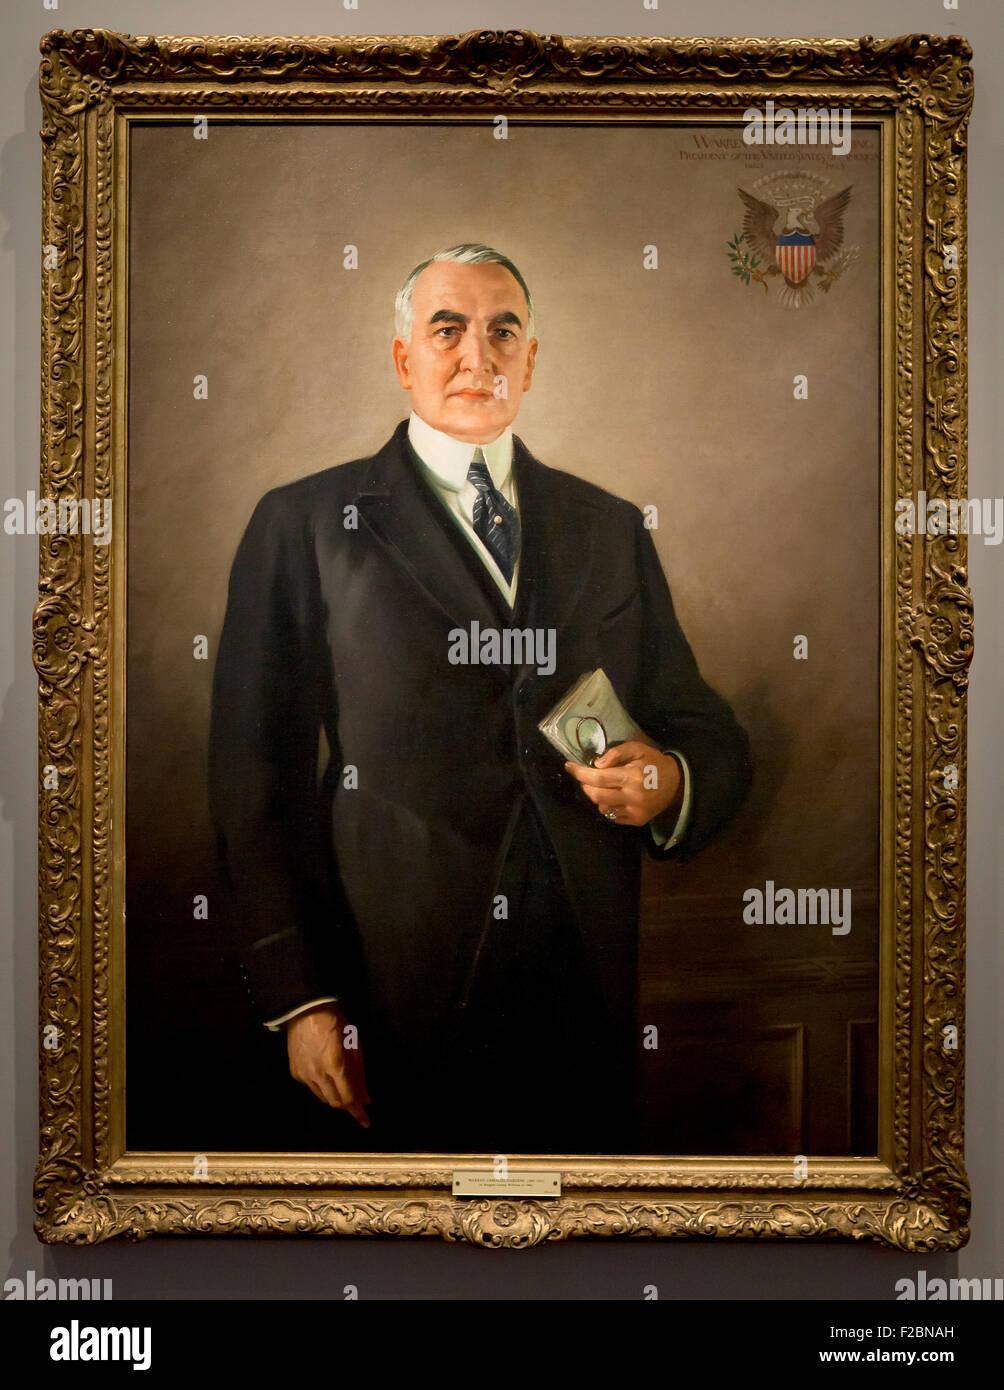 Warren G Harding by Margaret Lindsay Williams, circa 1923 - Stock Image